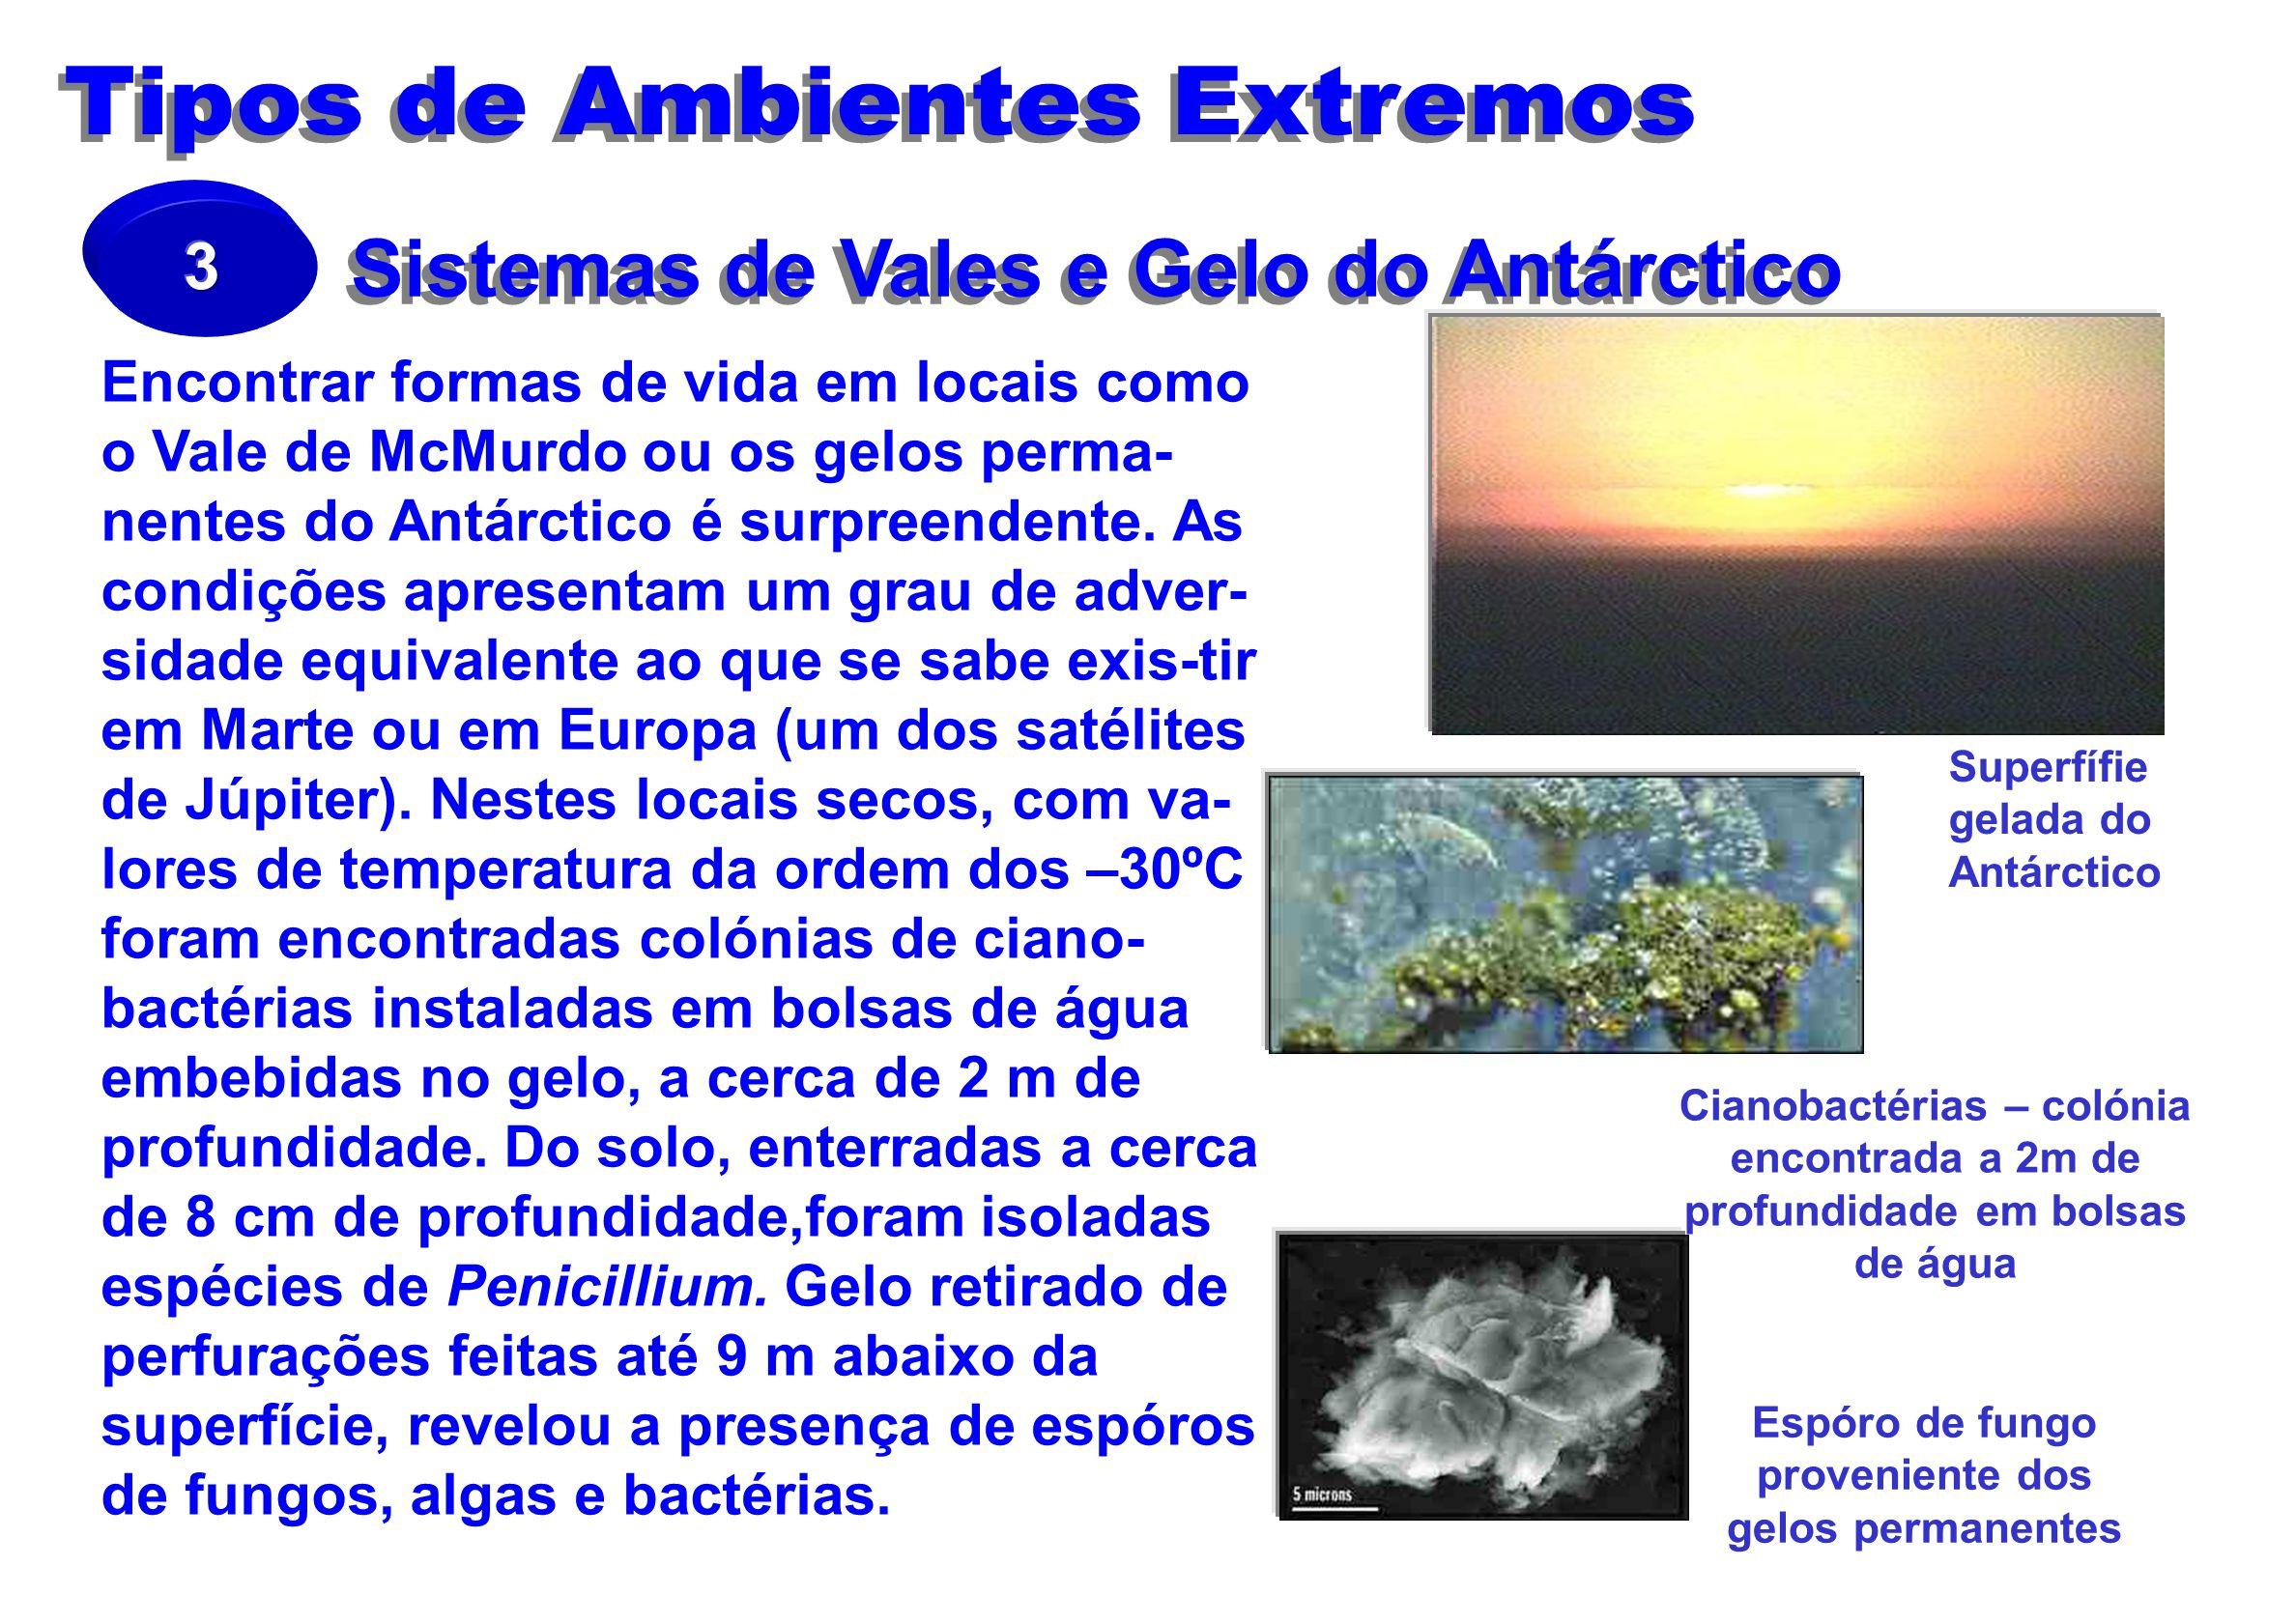 Sistemas de Vales e Gelo do Antárctico